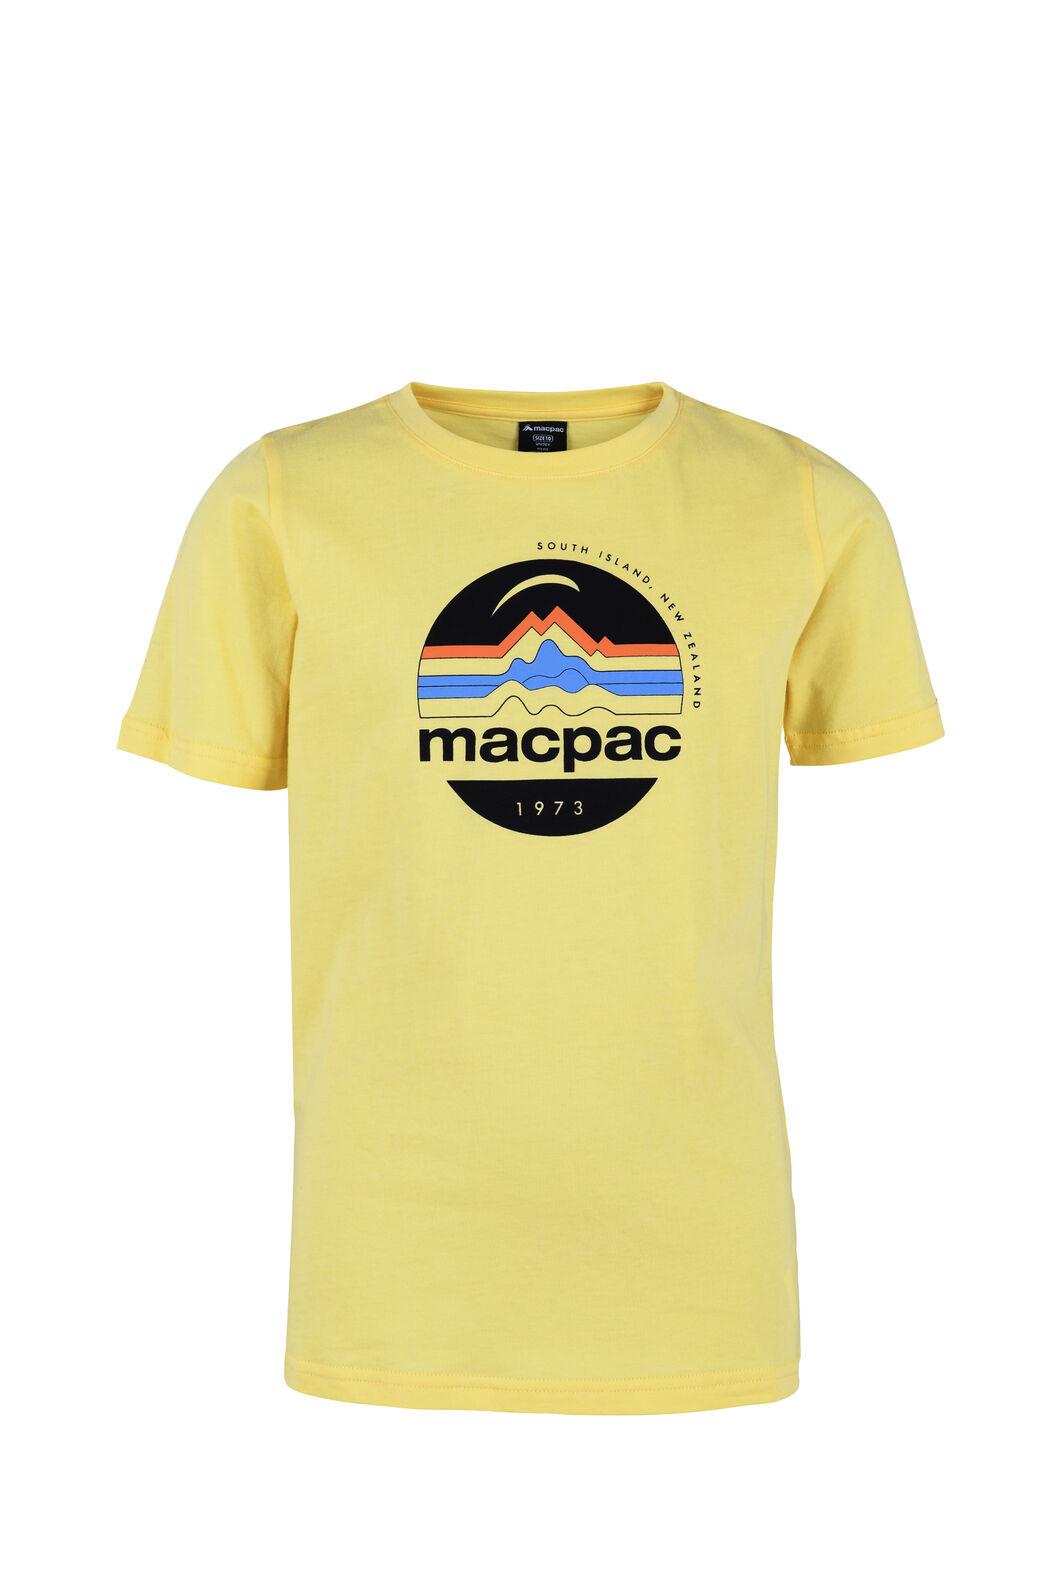 Macpac Retro Organic Tee - Kids', Sunshine, hi-res